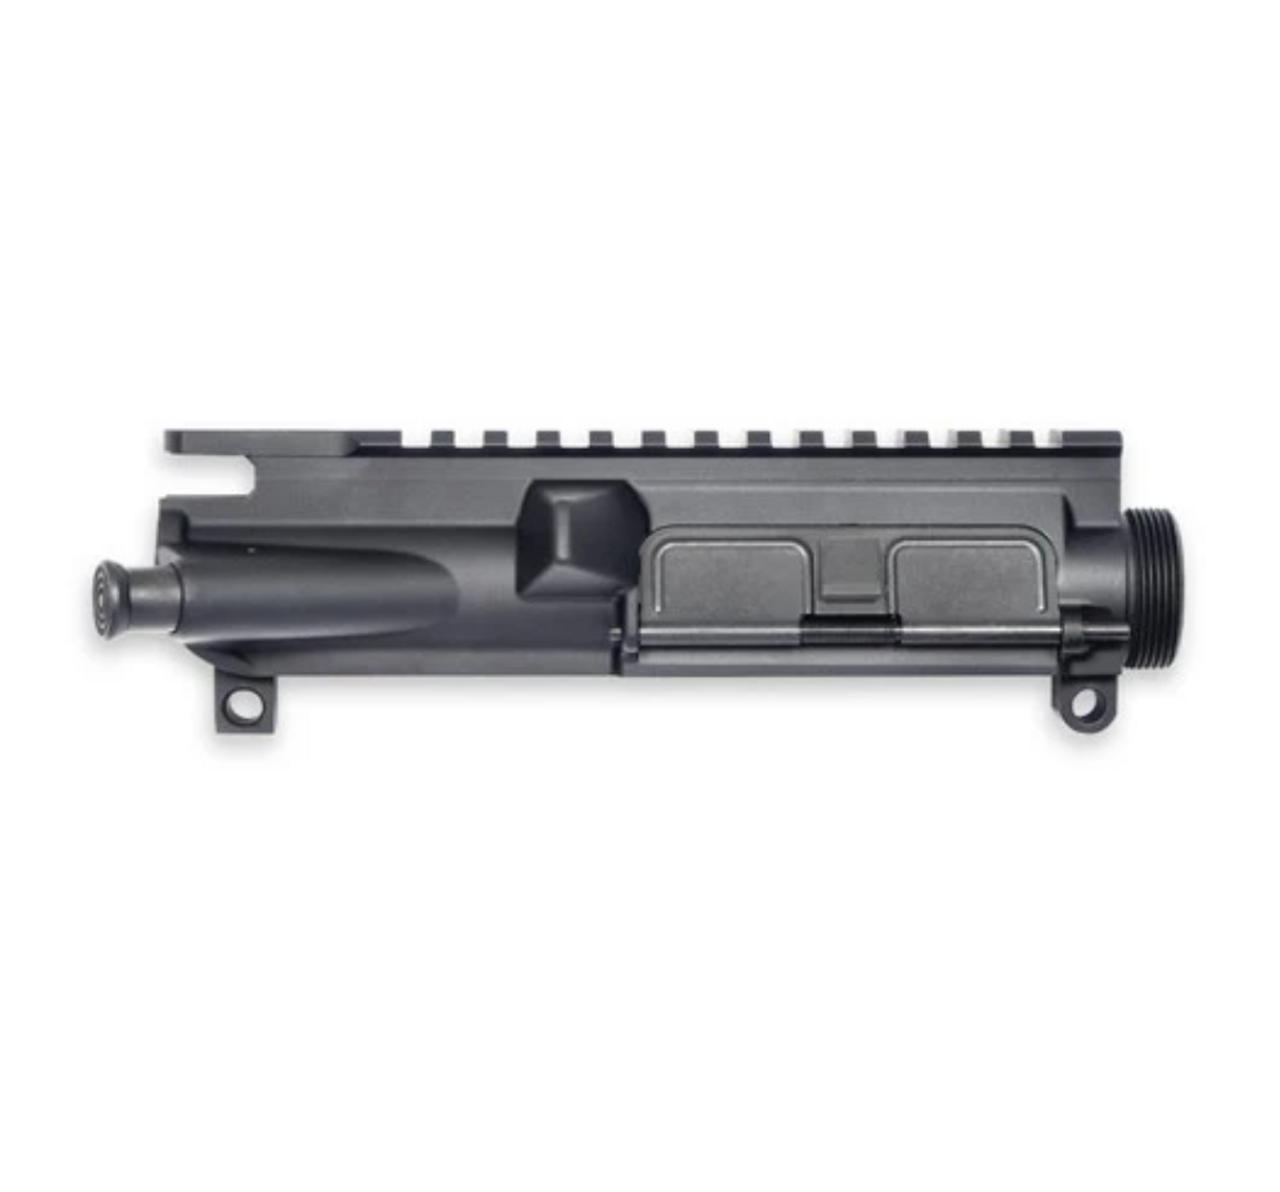 AR-15 Upper Receiver